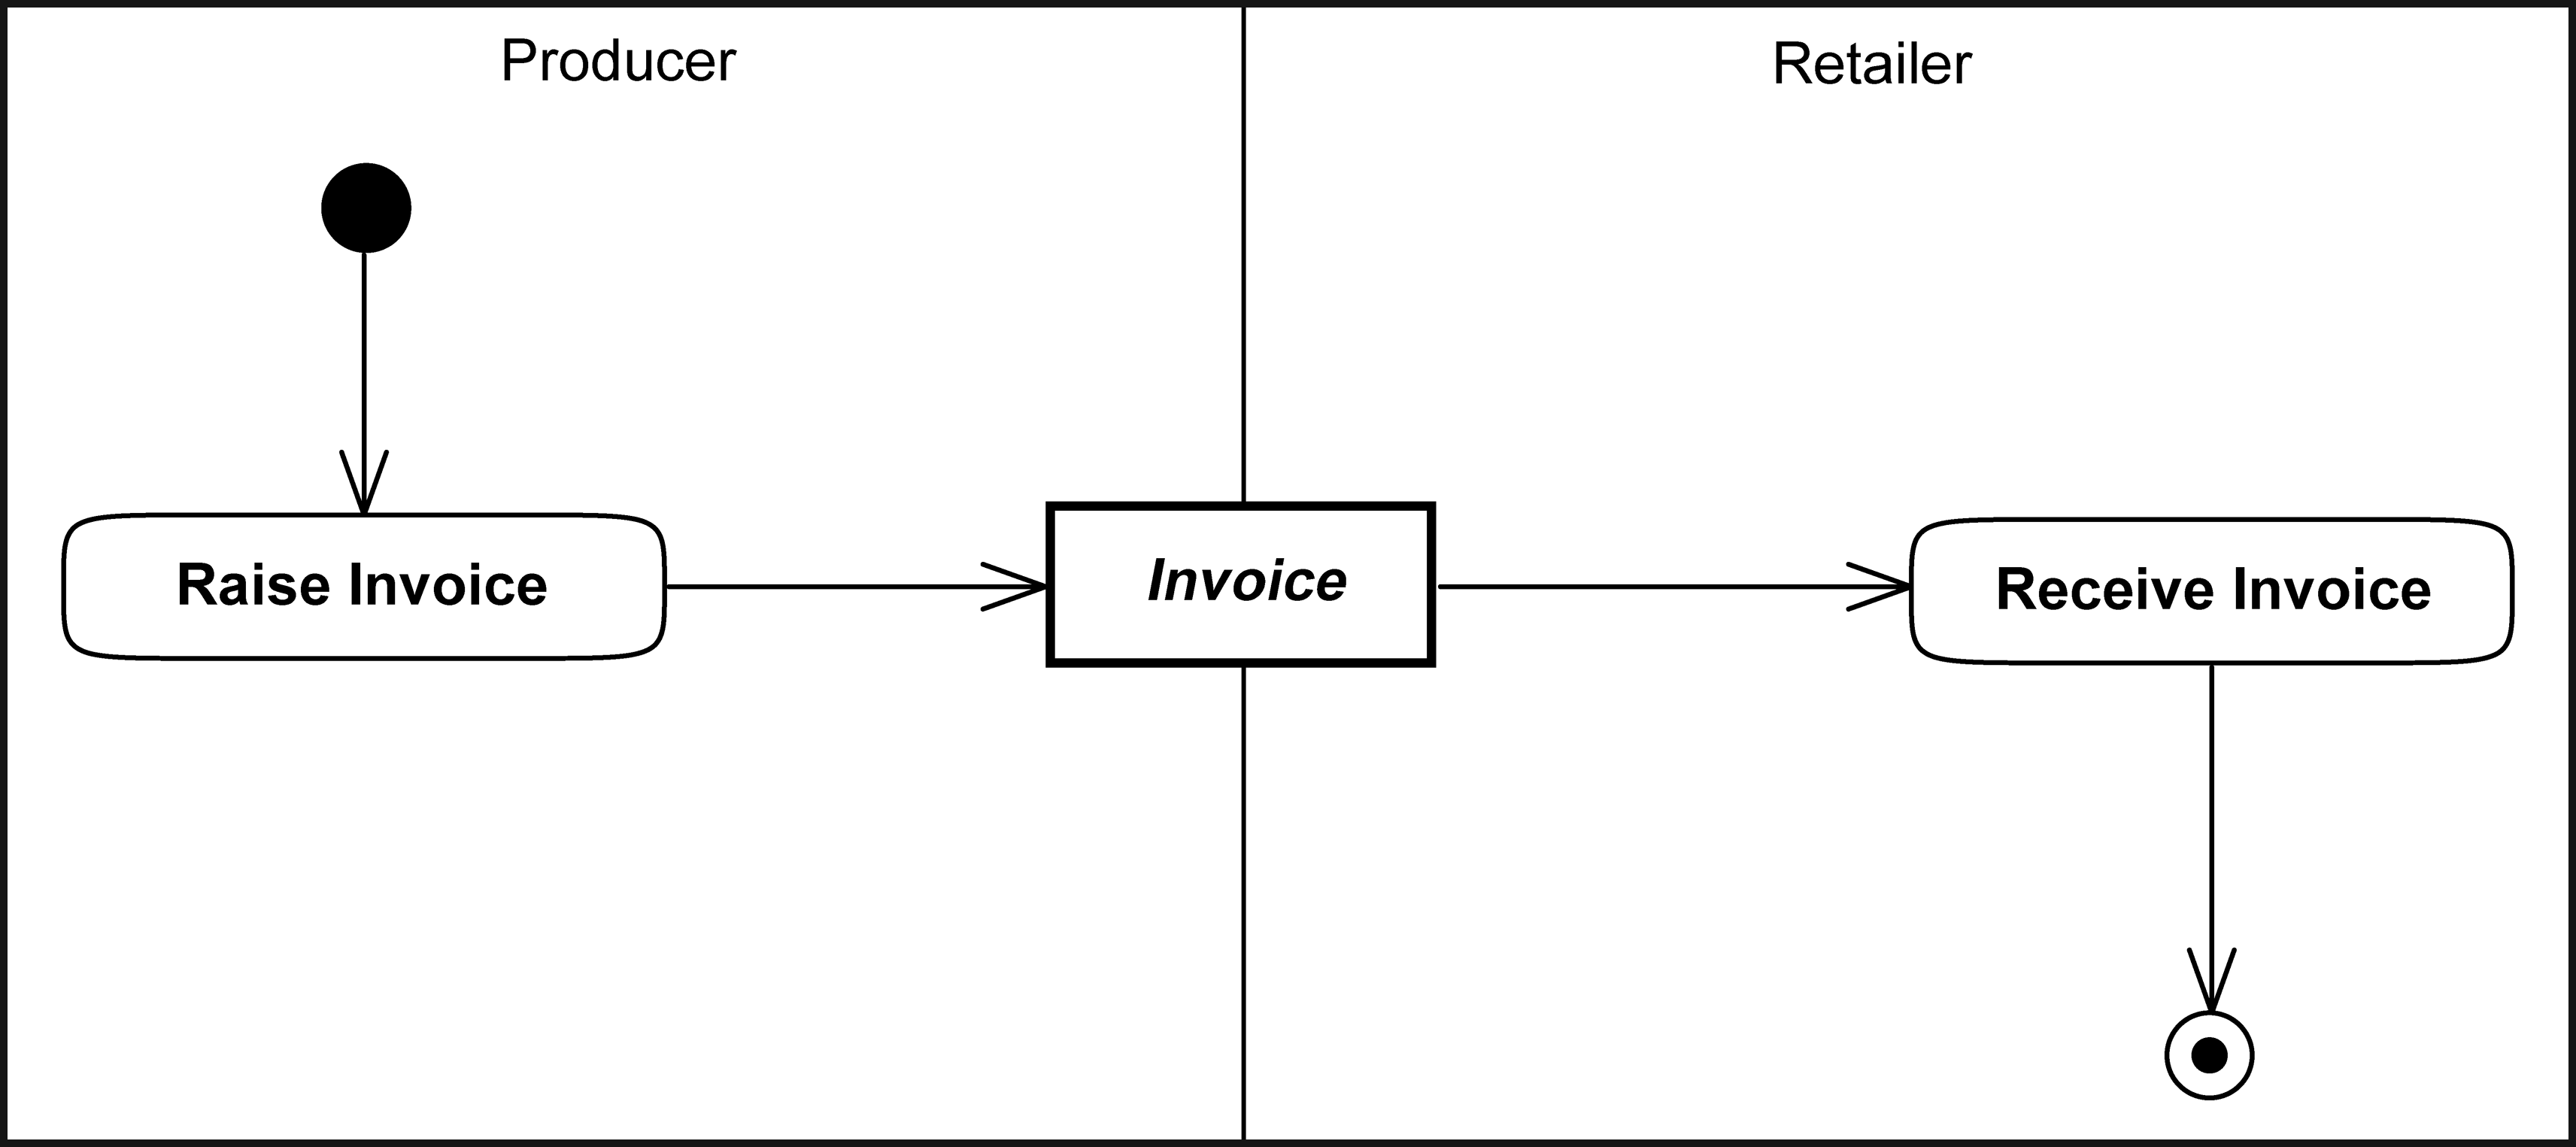 Index Of Ubl Prd3 21 Art Artpdf Vmi Wiring Diagram Invoicing